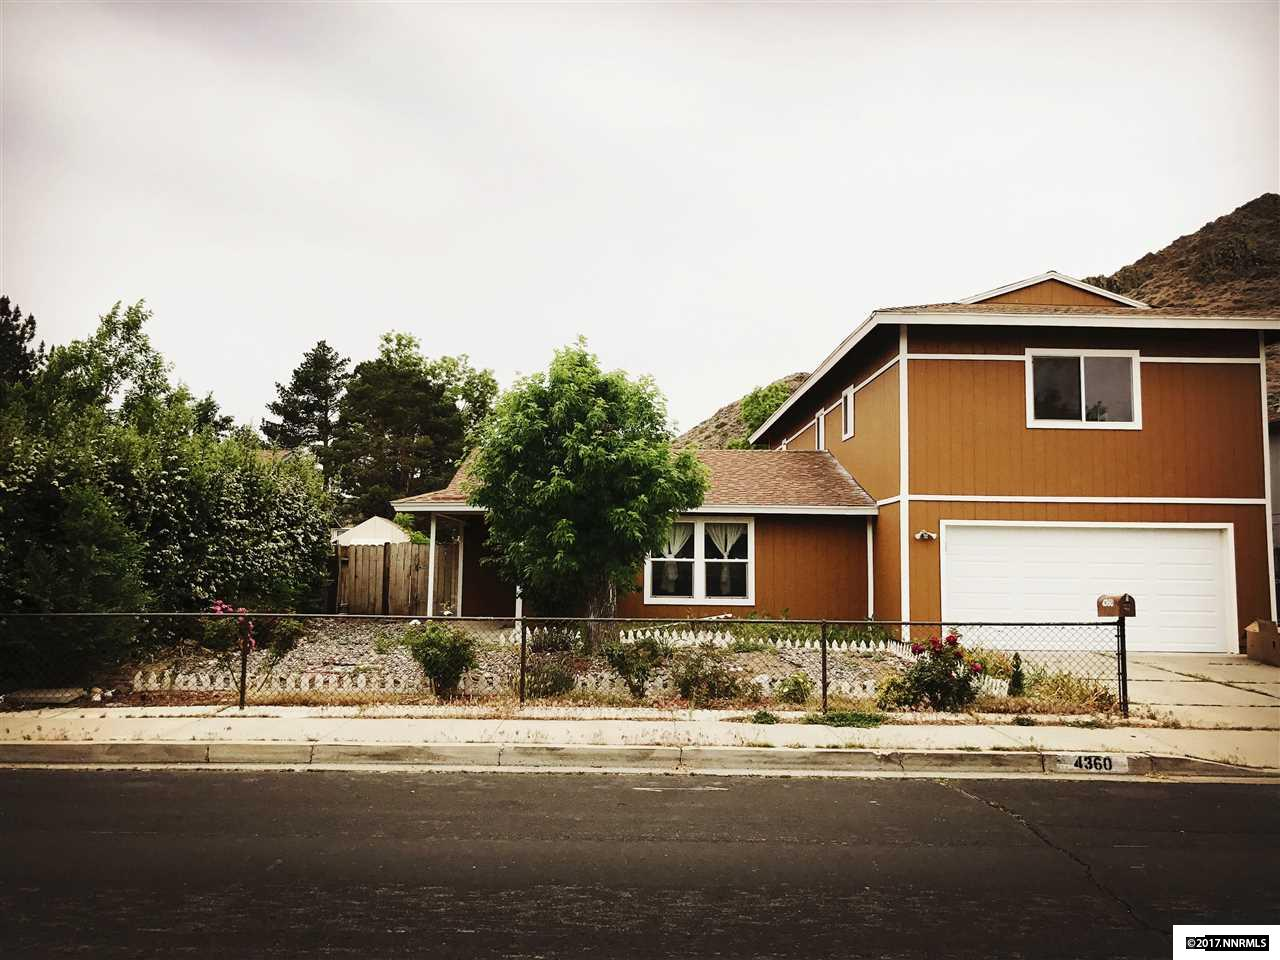 Image for 4360 Spring drive, Reno, NV 89502